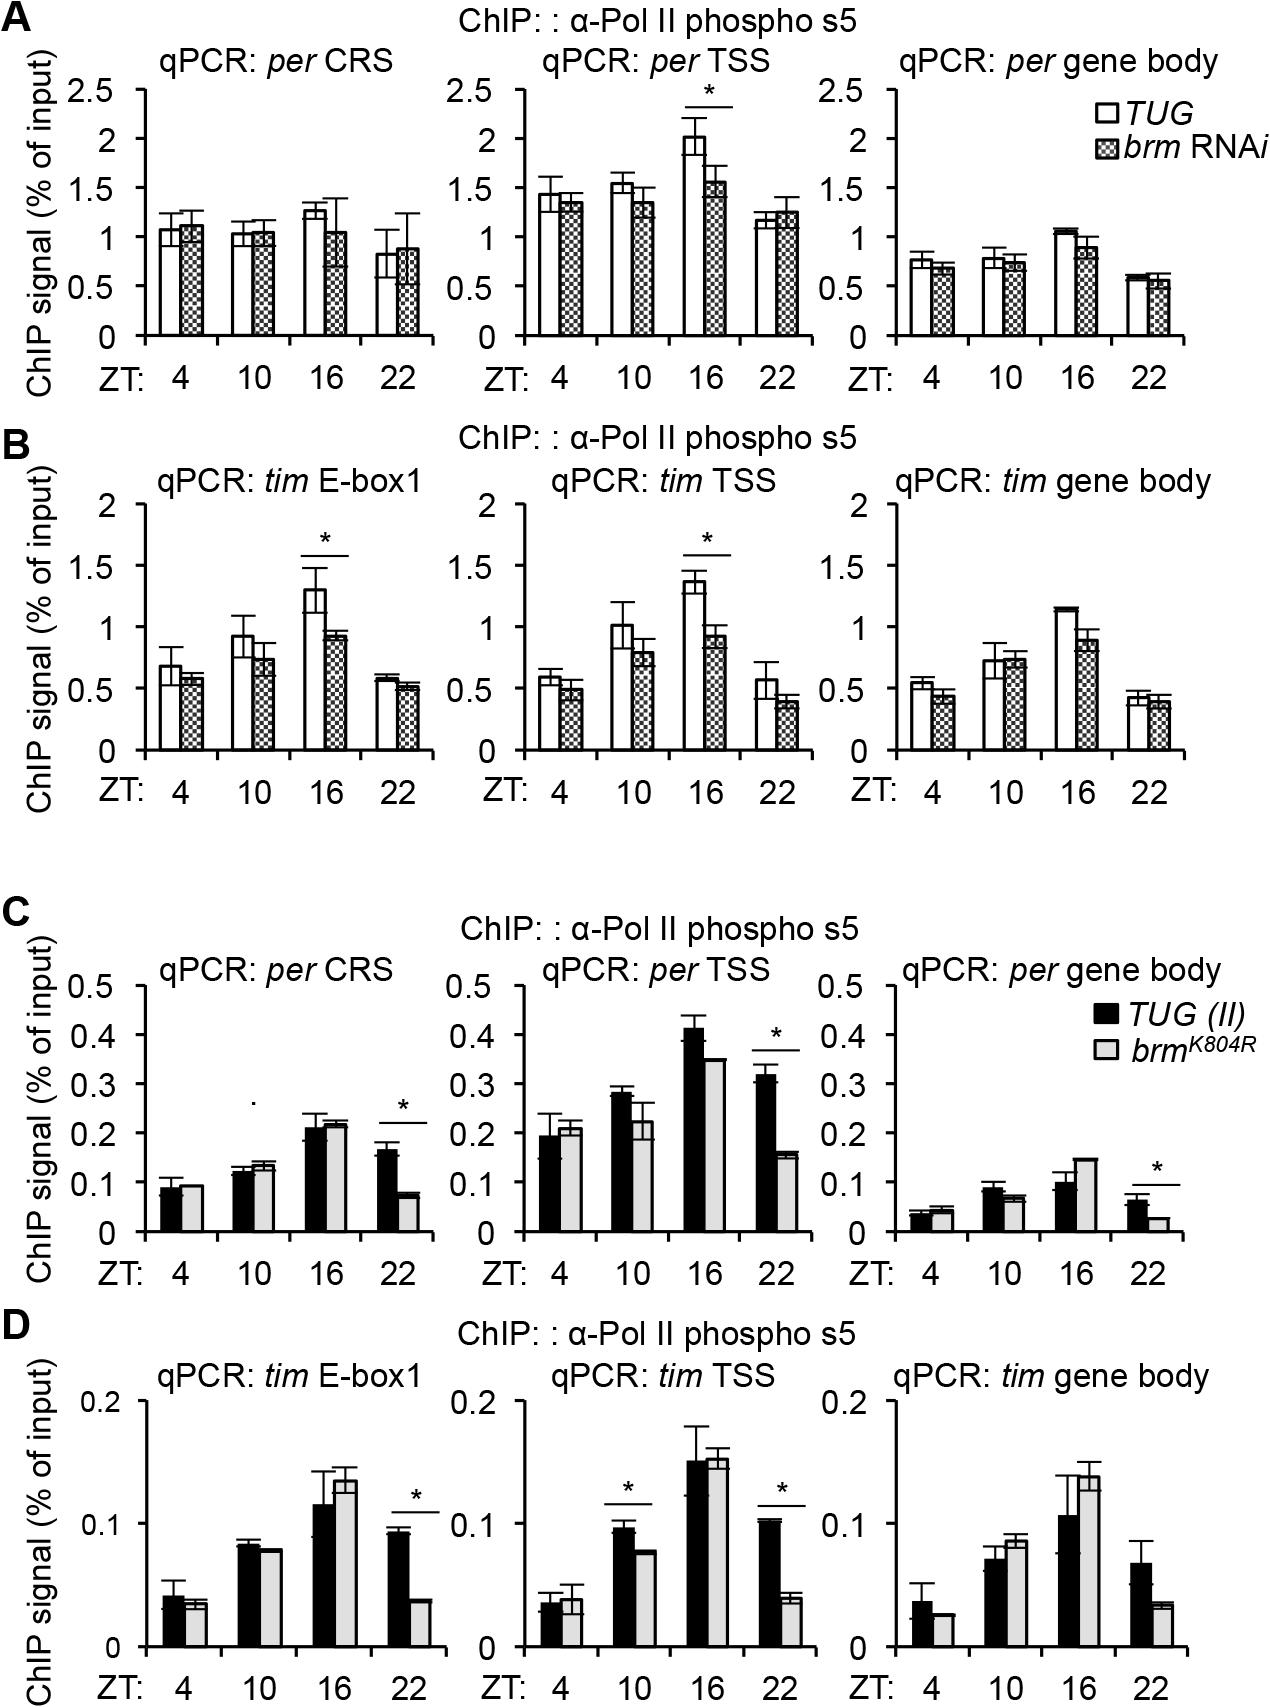 BRM-established chromatin landscape plays a role in regulating RNAPII dynamics.